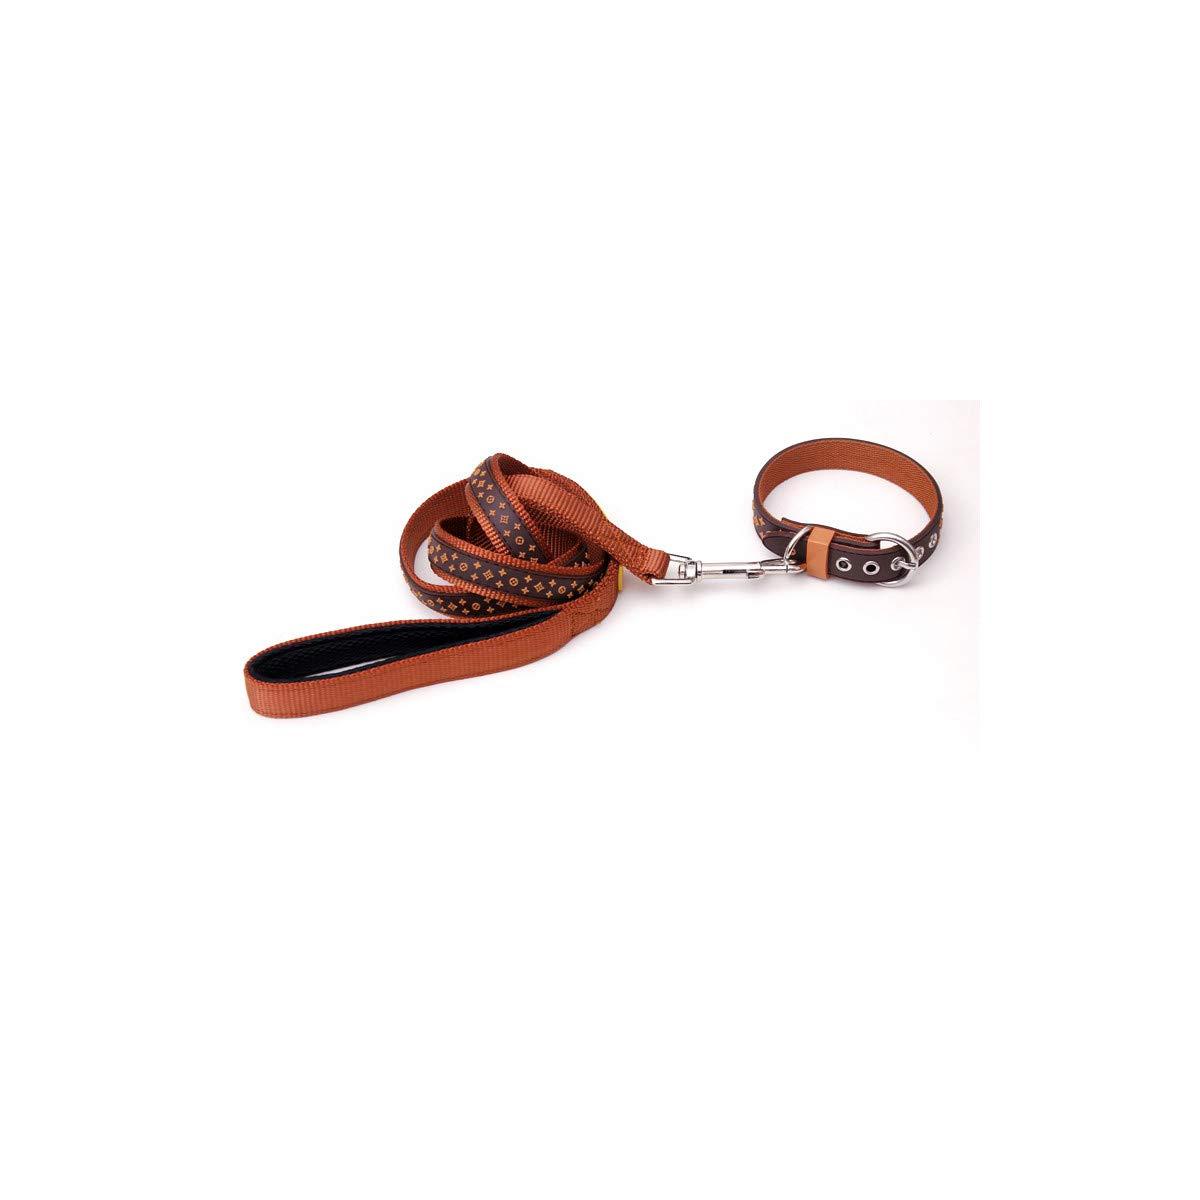 Brown Collar Lead S Brown Collar Lead S Jesiceeal for Pet Lead Small Pet Dog Collar Lead Black Brown Rubber & Nylon Pet Leash 1Pcs Lot Brown Collar Lead S